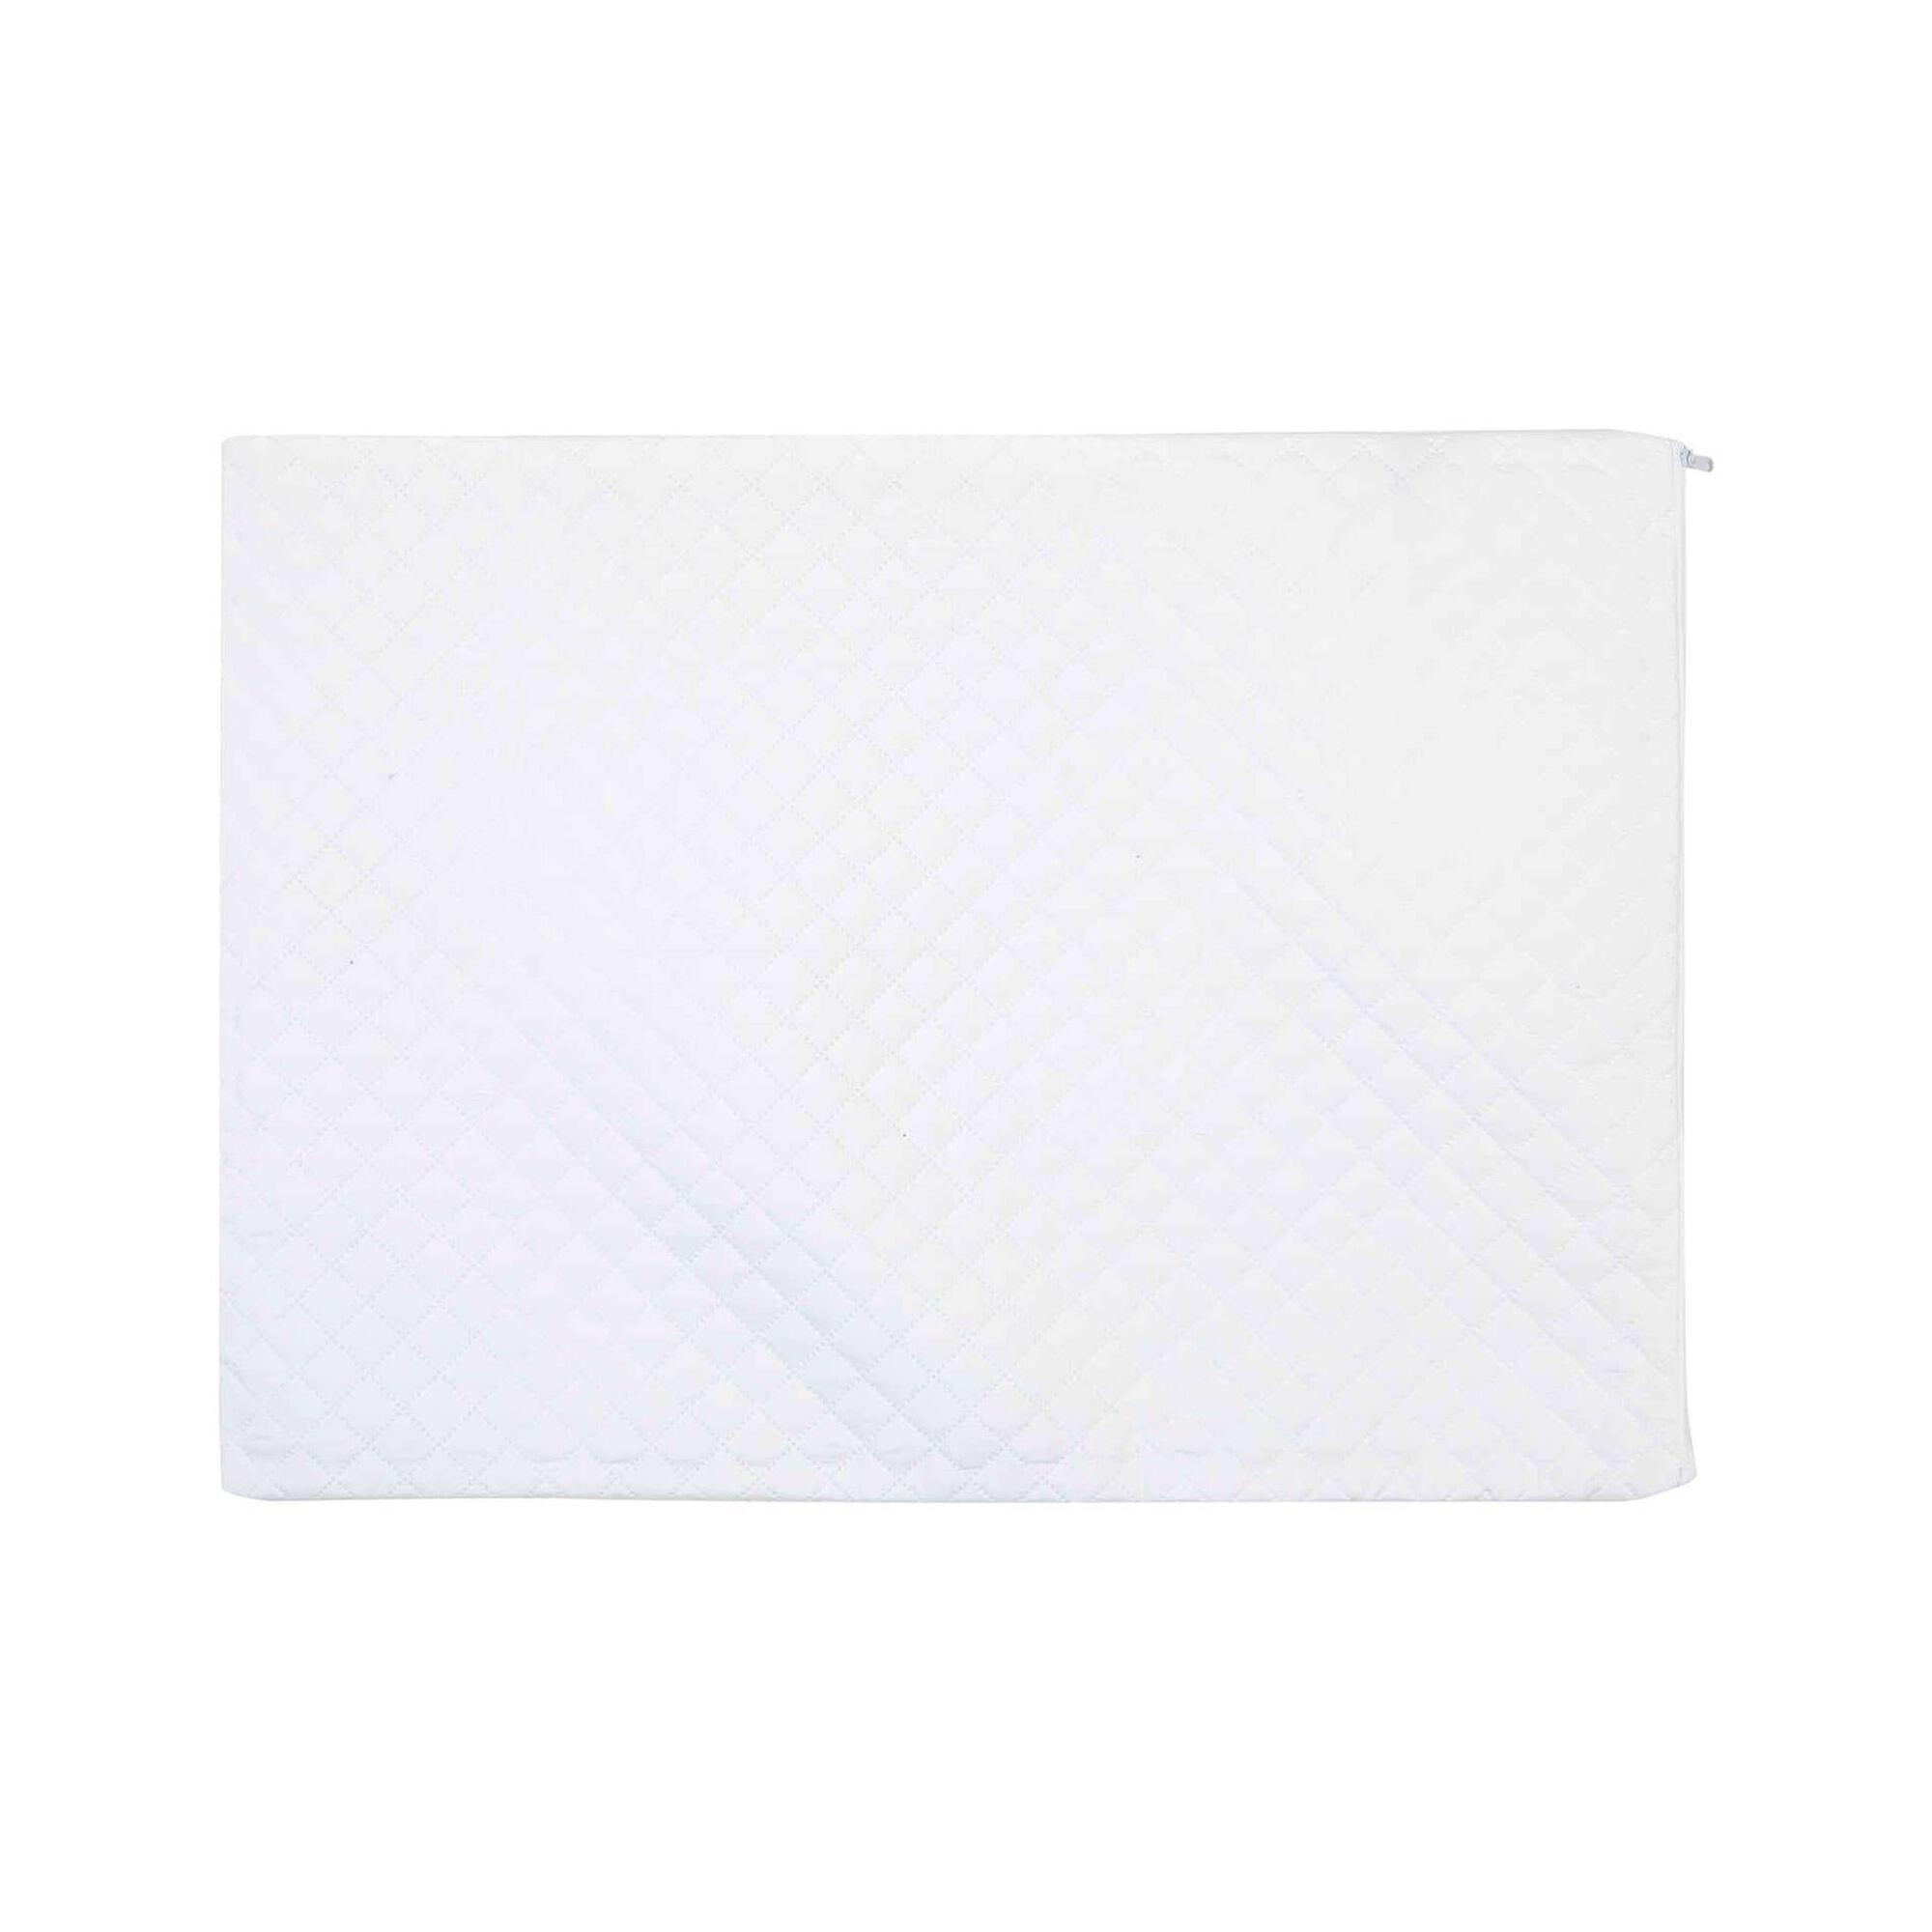 Protetor Almofada Acolchoado com Fecho 45x60cm Branco